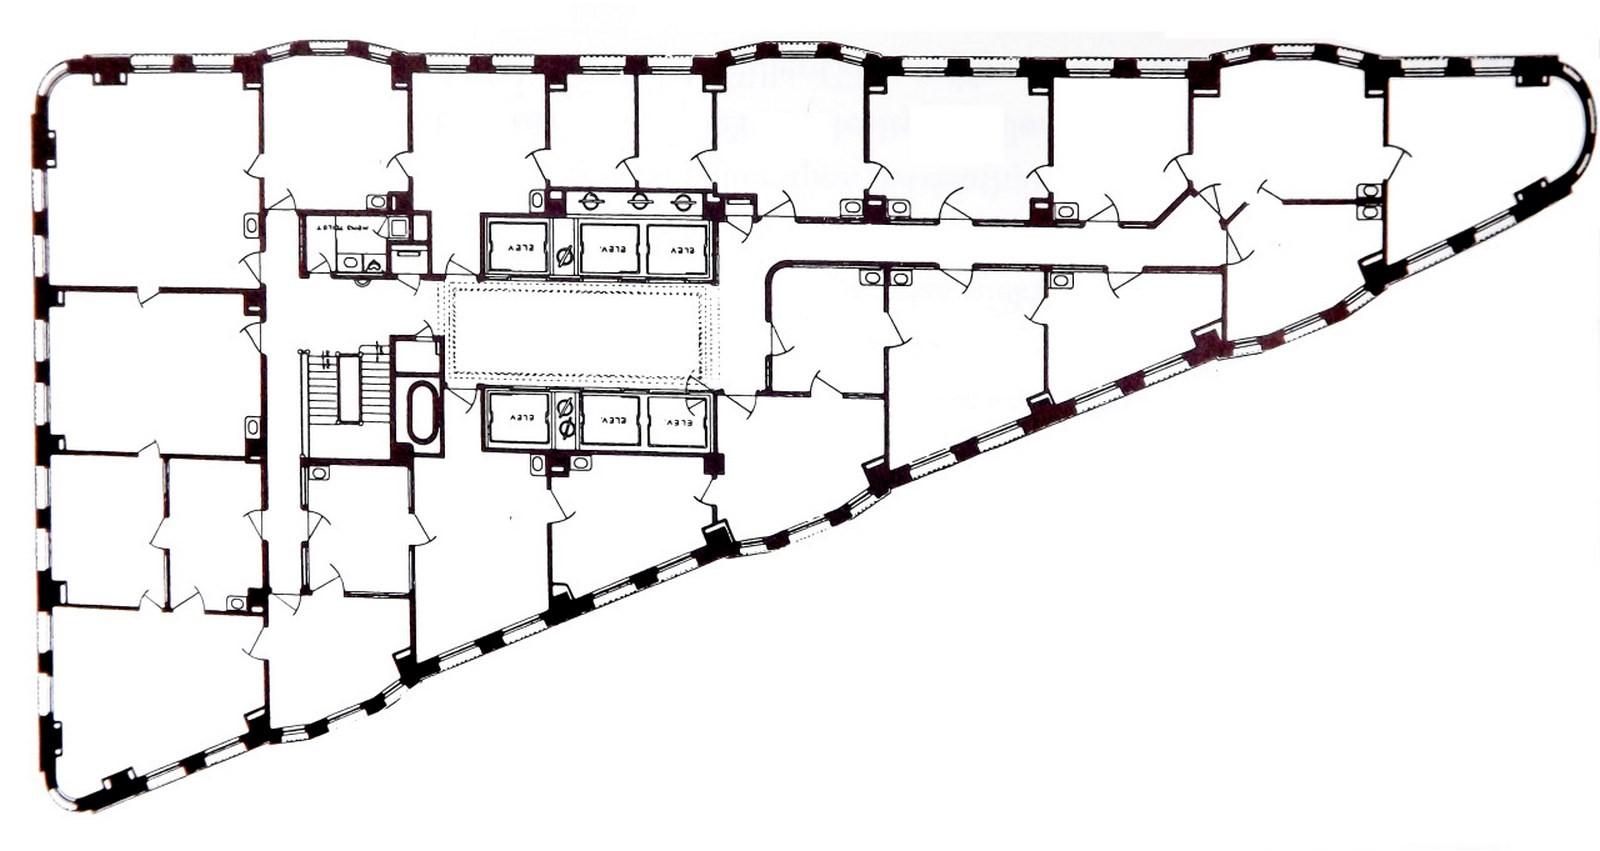 Flatiron Building, New York [1902]. - Sheet5